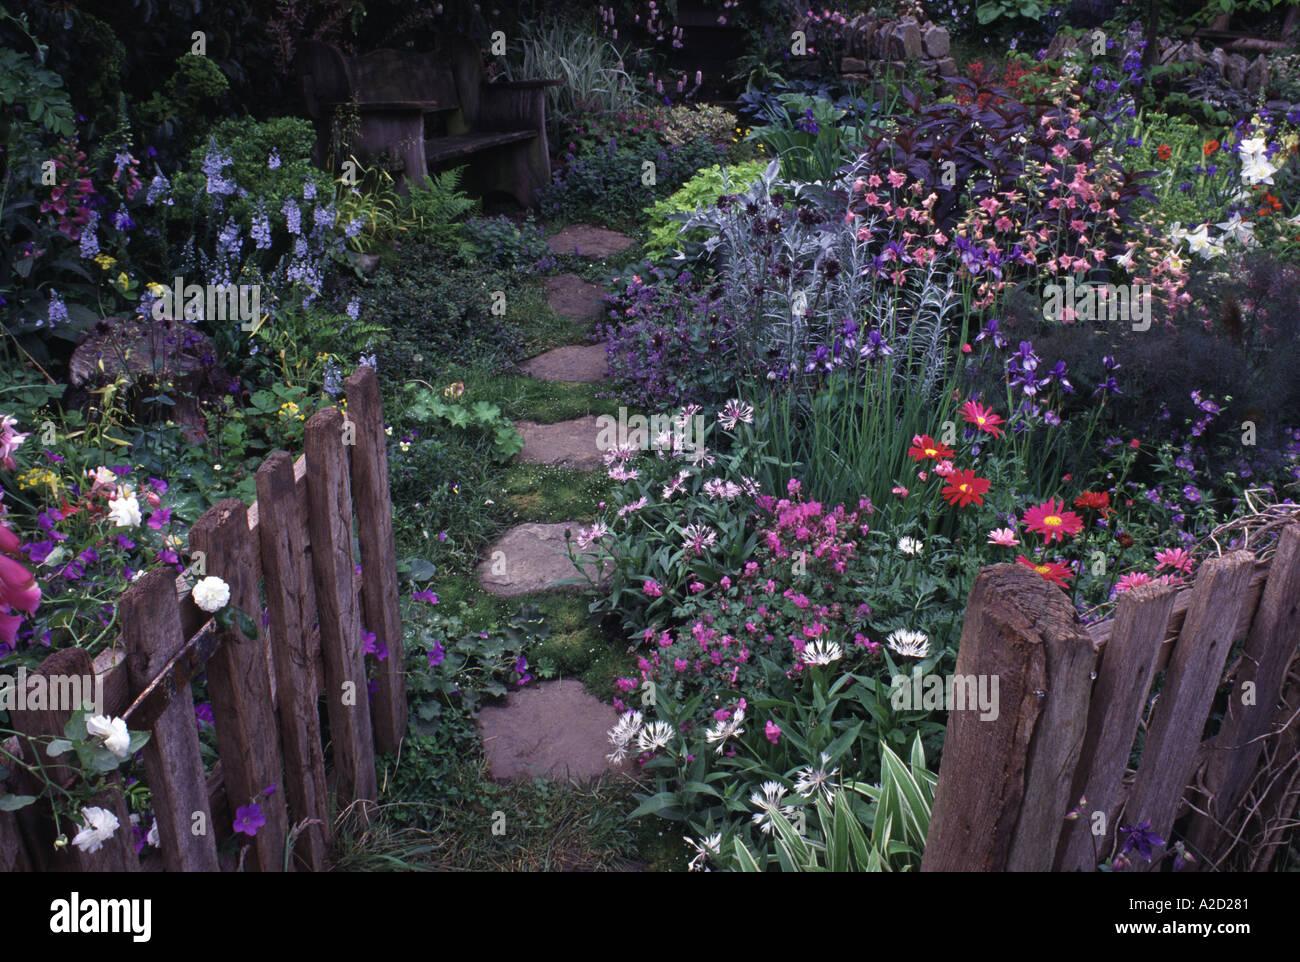 cottage planted garden looking through gate chelsea flower show 2002